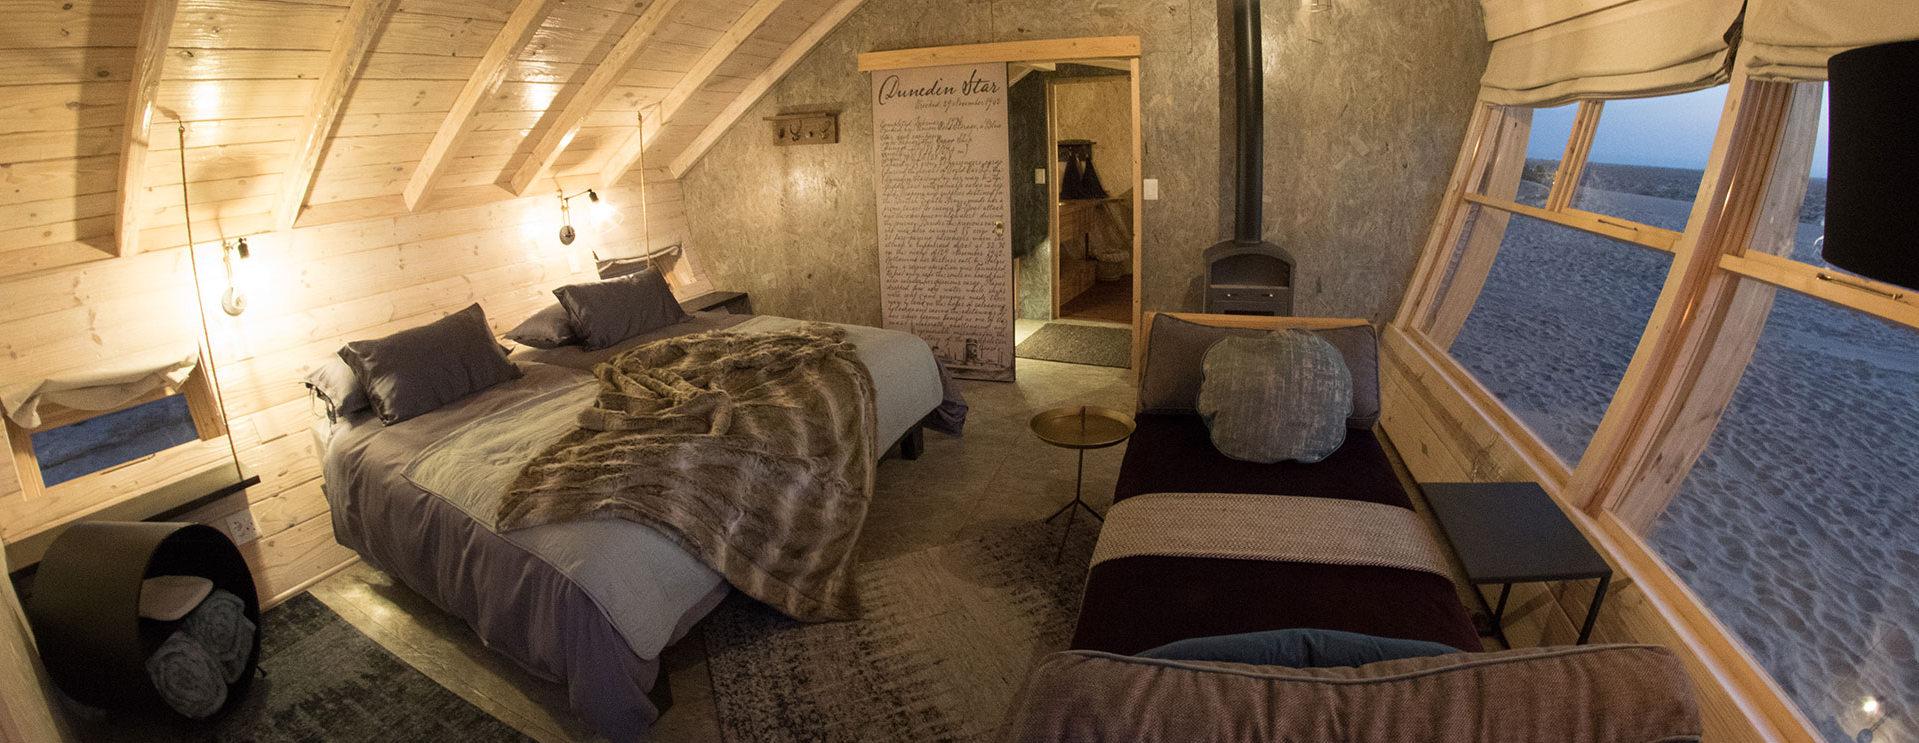 shipwreck-lodge-bedroom-interior